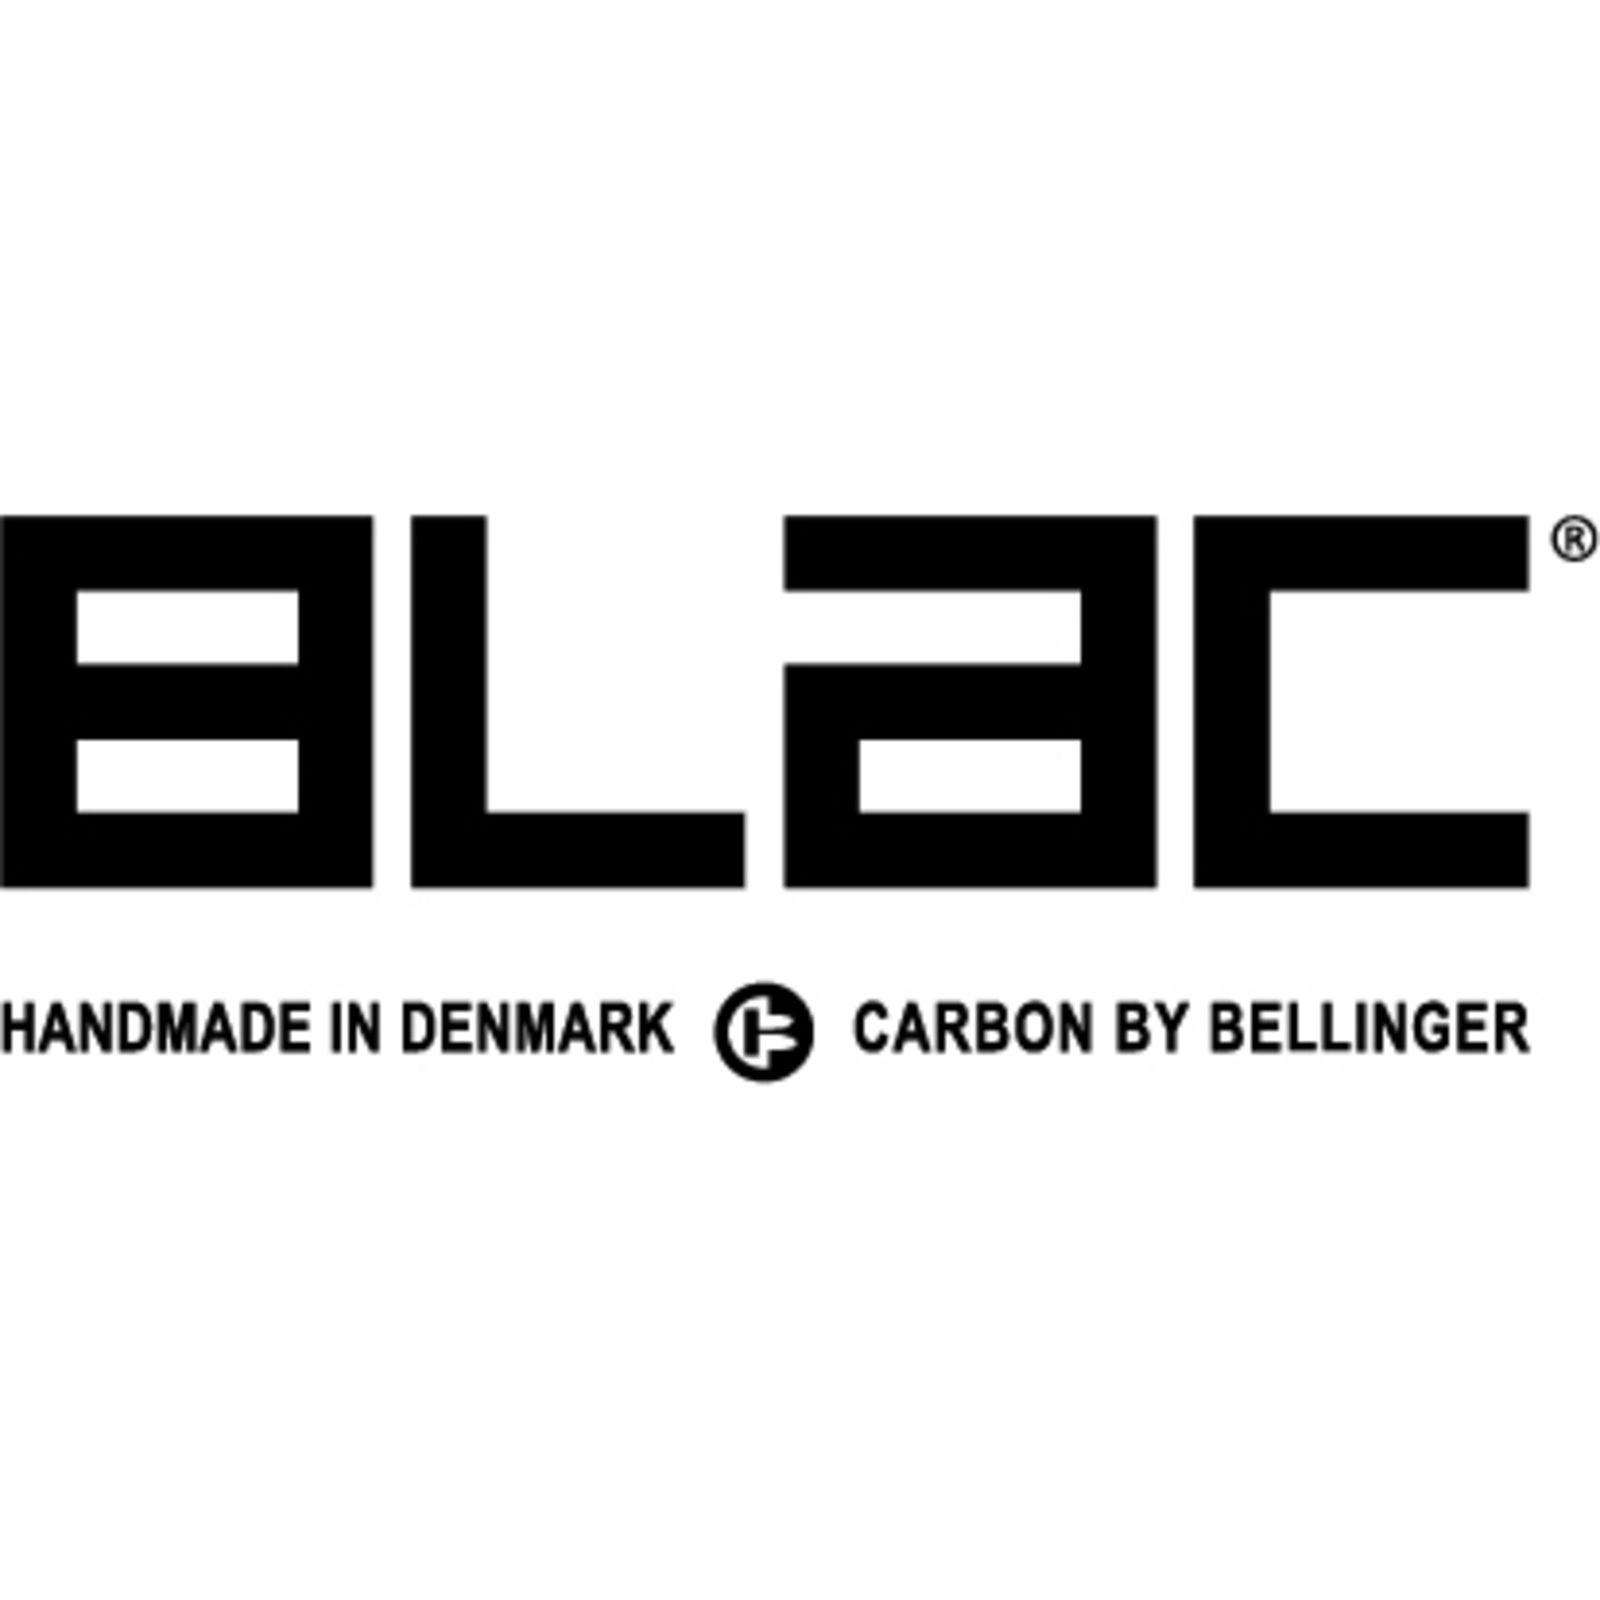 BLAC®